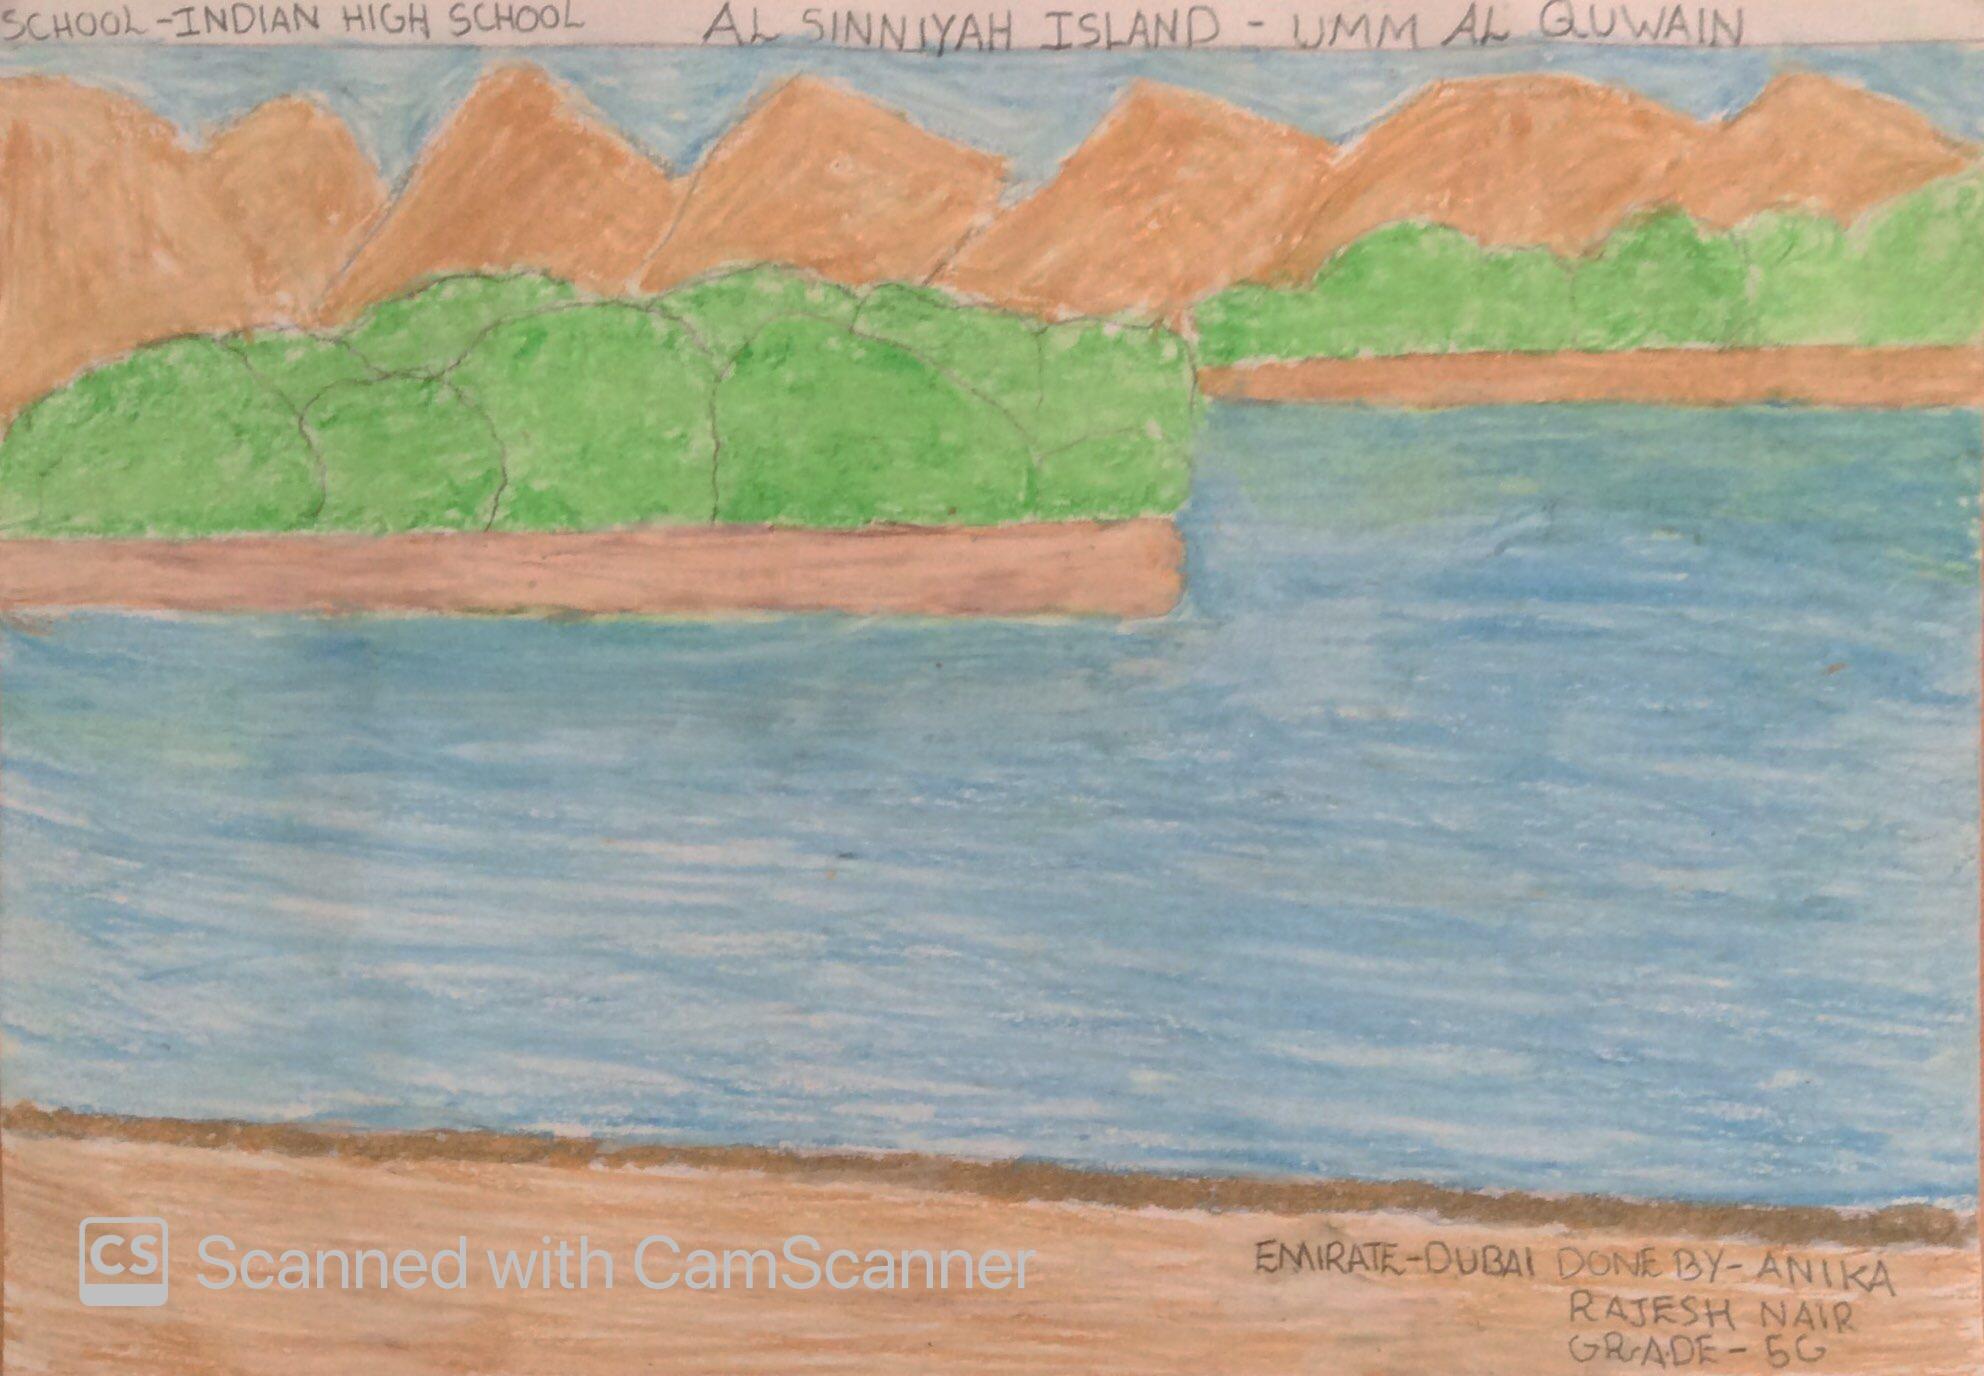 AL SINNIYAH ISLAND – UMM AL QUWAIN by Anika Rajesh Nair